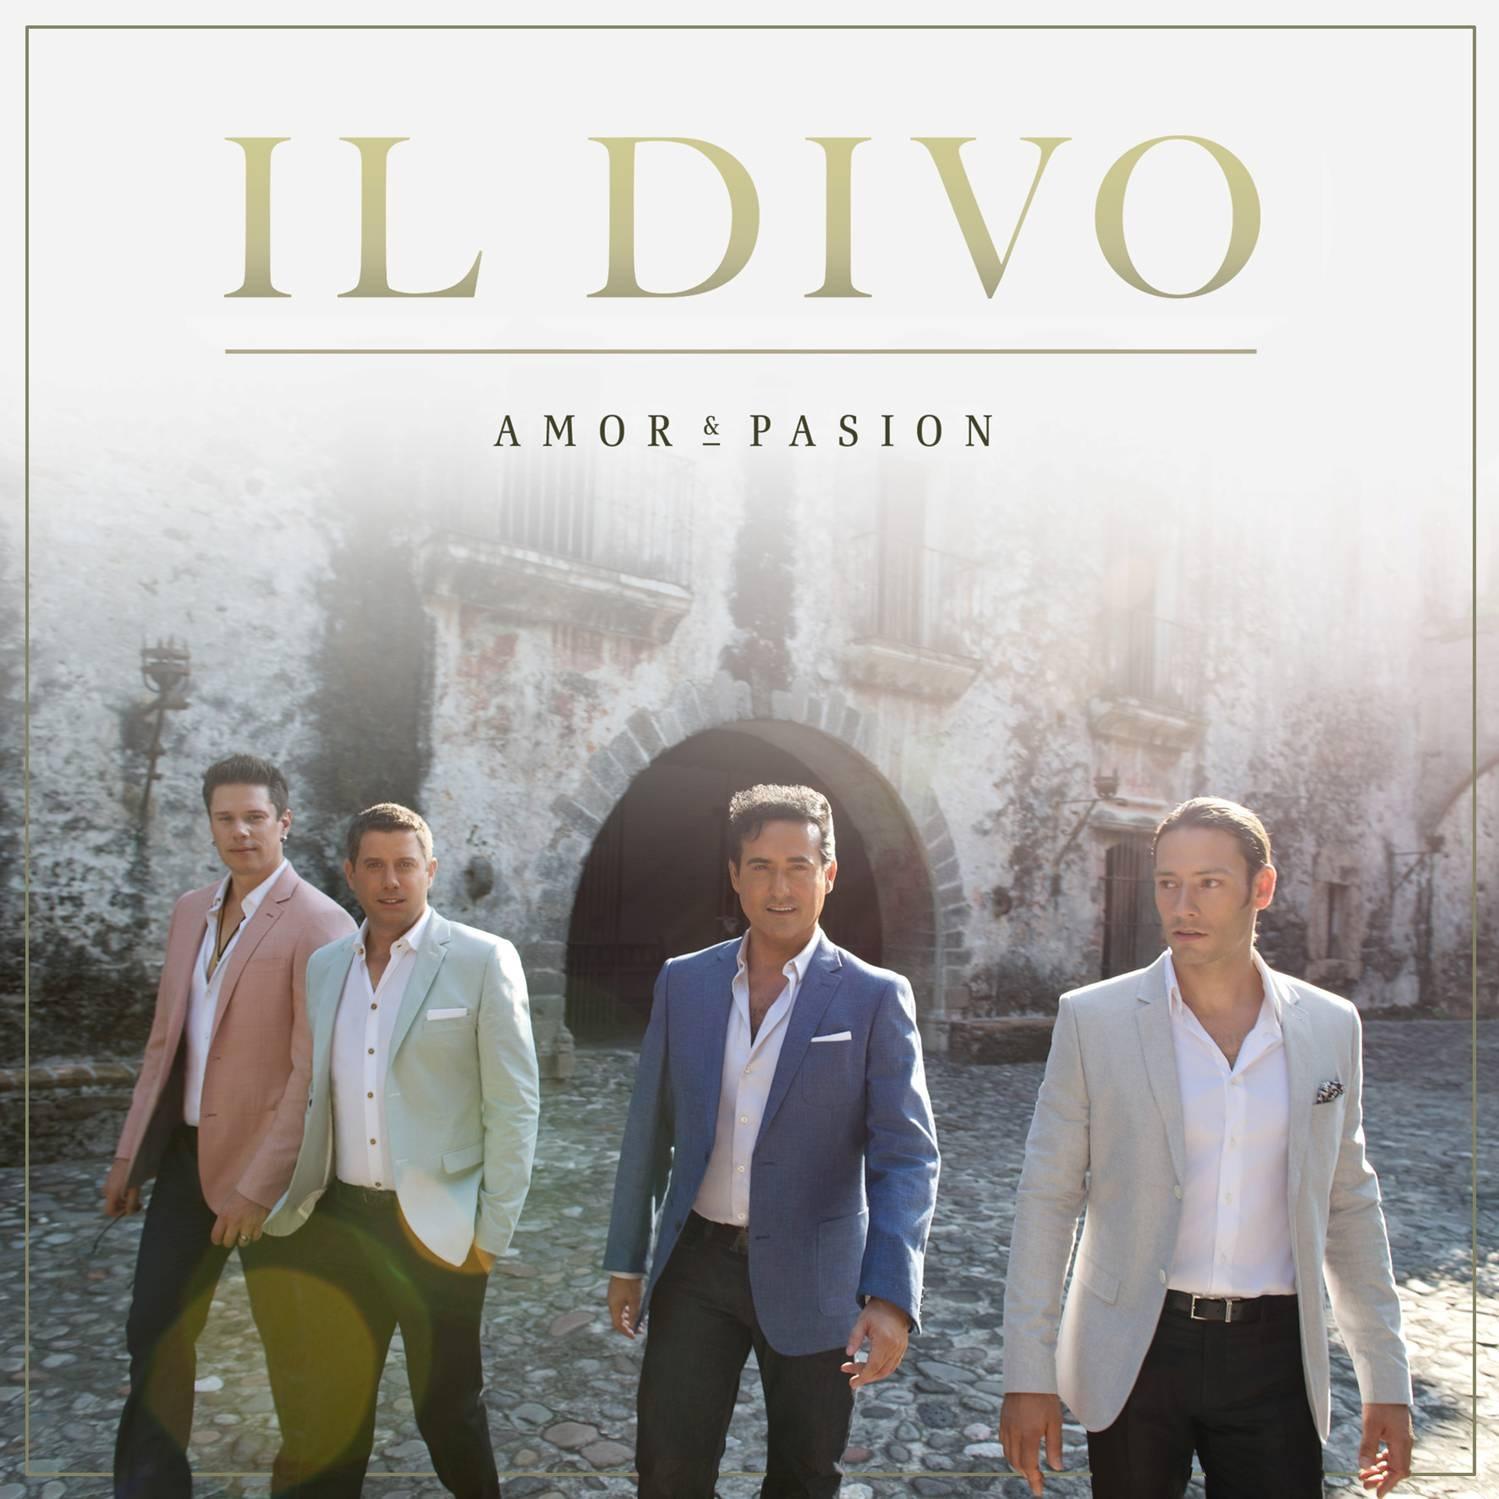 IlDivo_AmorYPasion_album